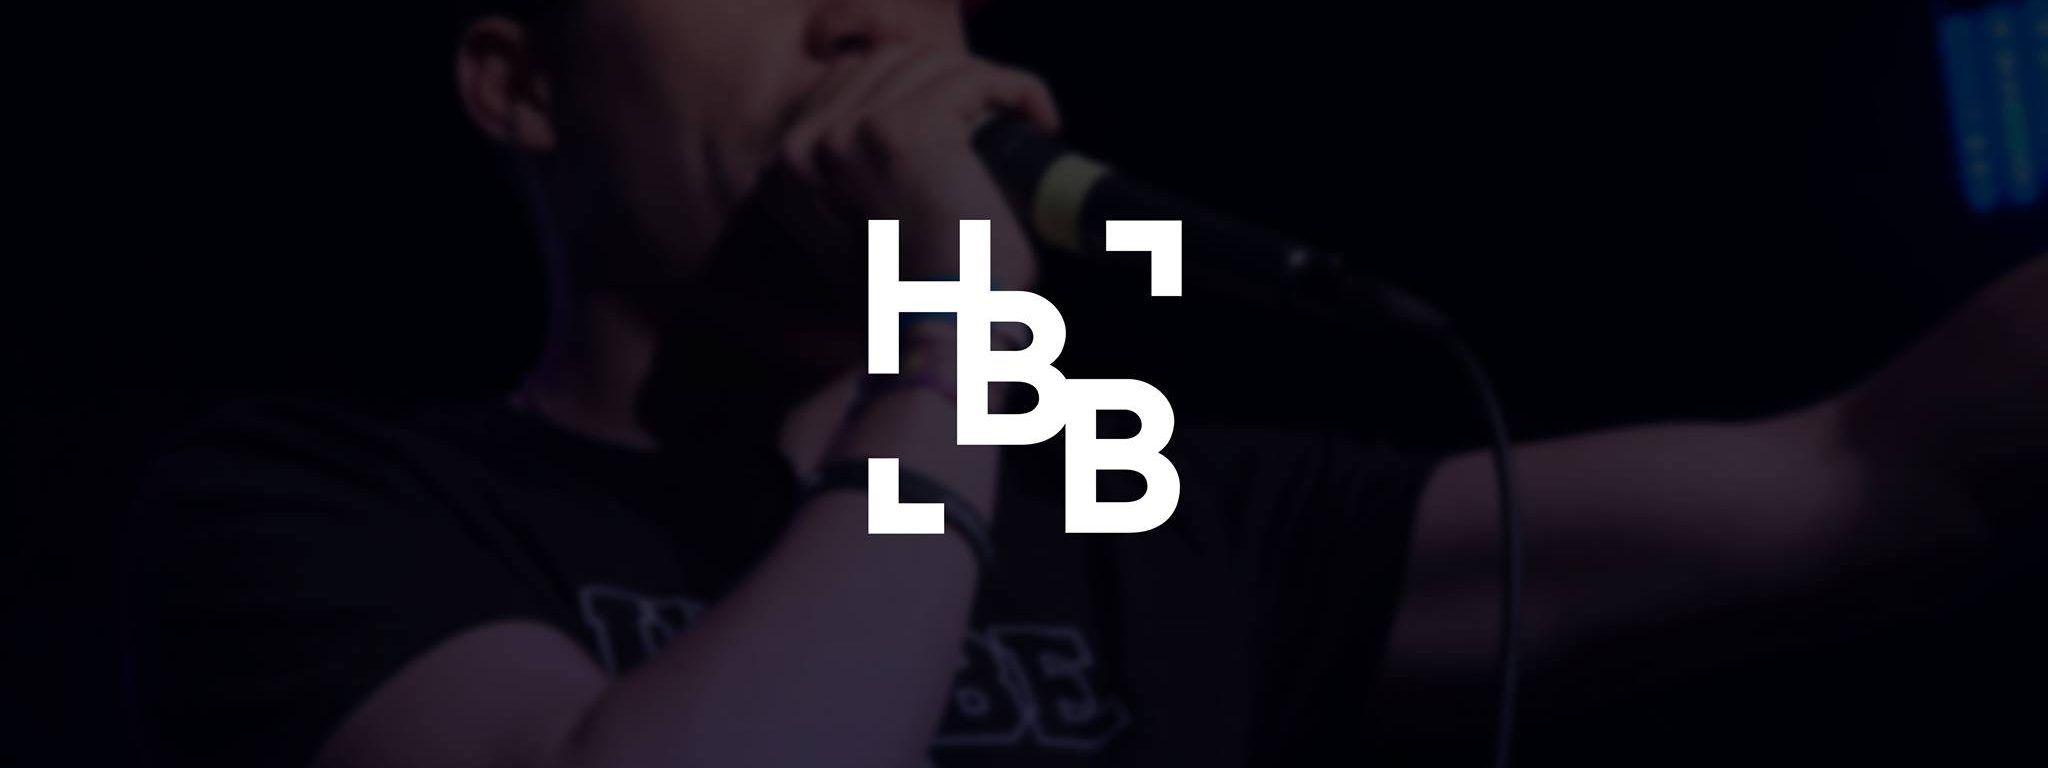 Humanbeatbox